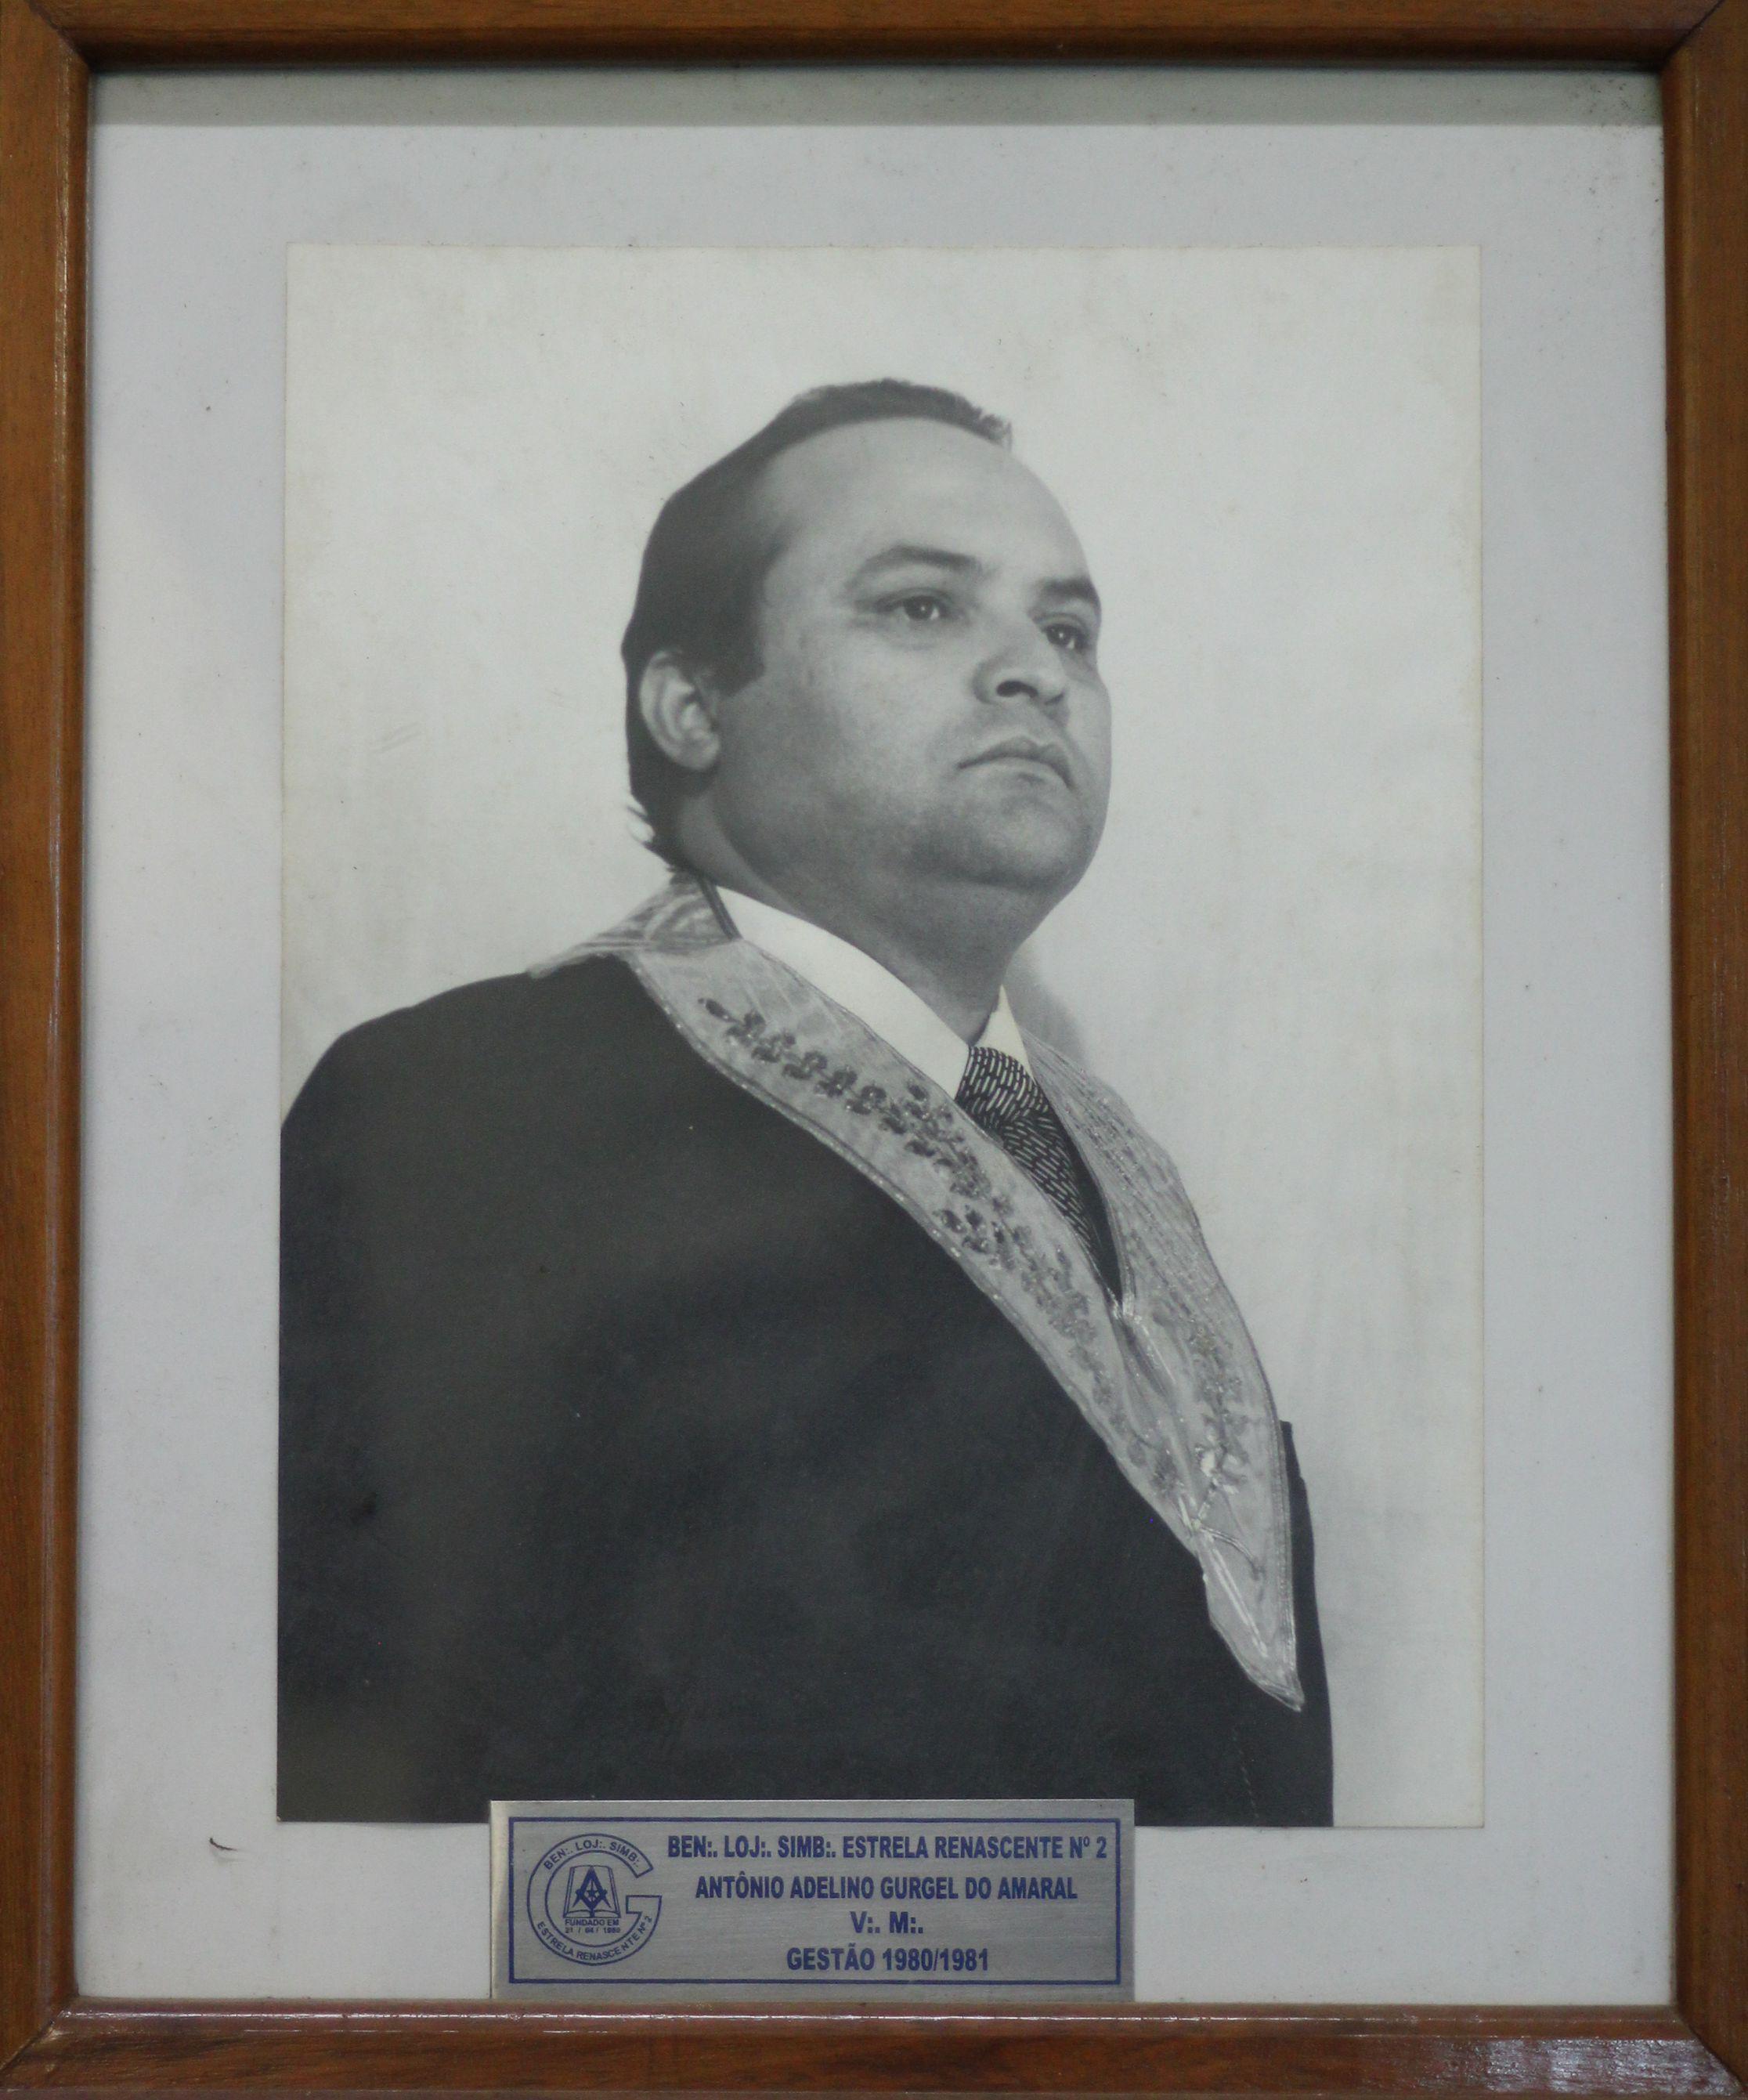 Antônio A Gurgel do Amaral - 80/83